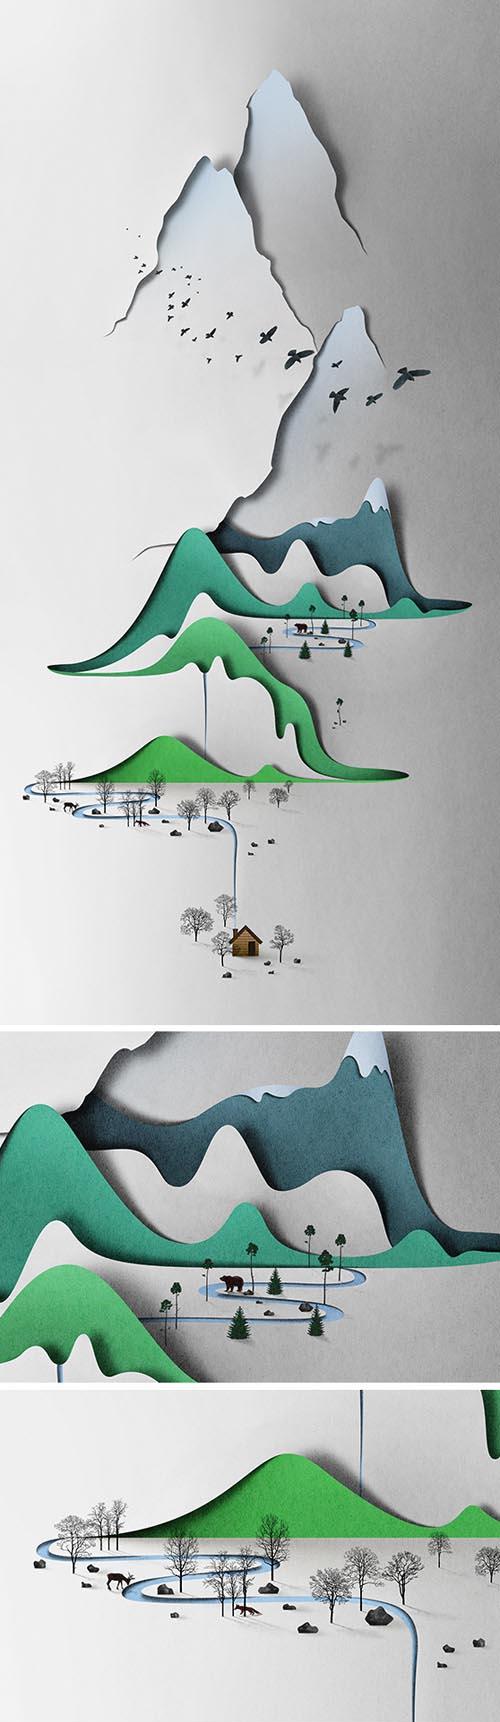 Eiko Ojala - papercut 1